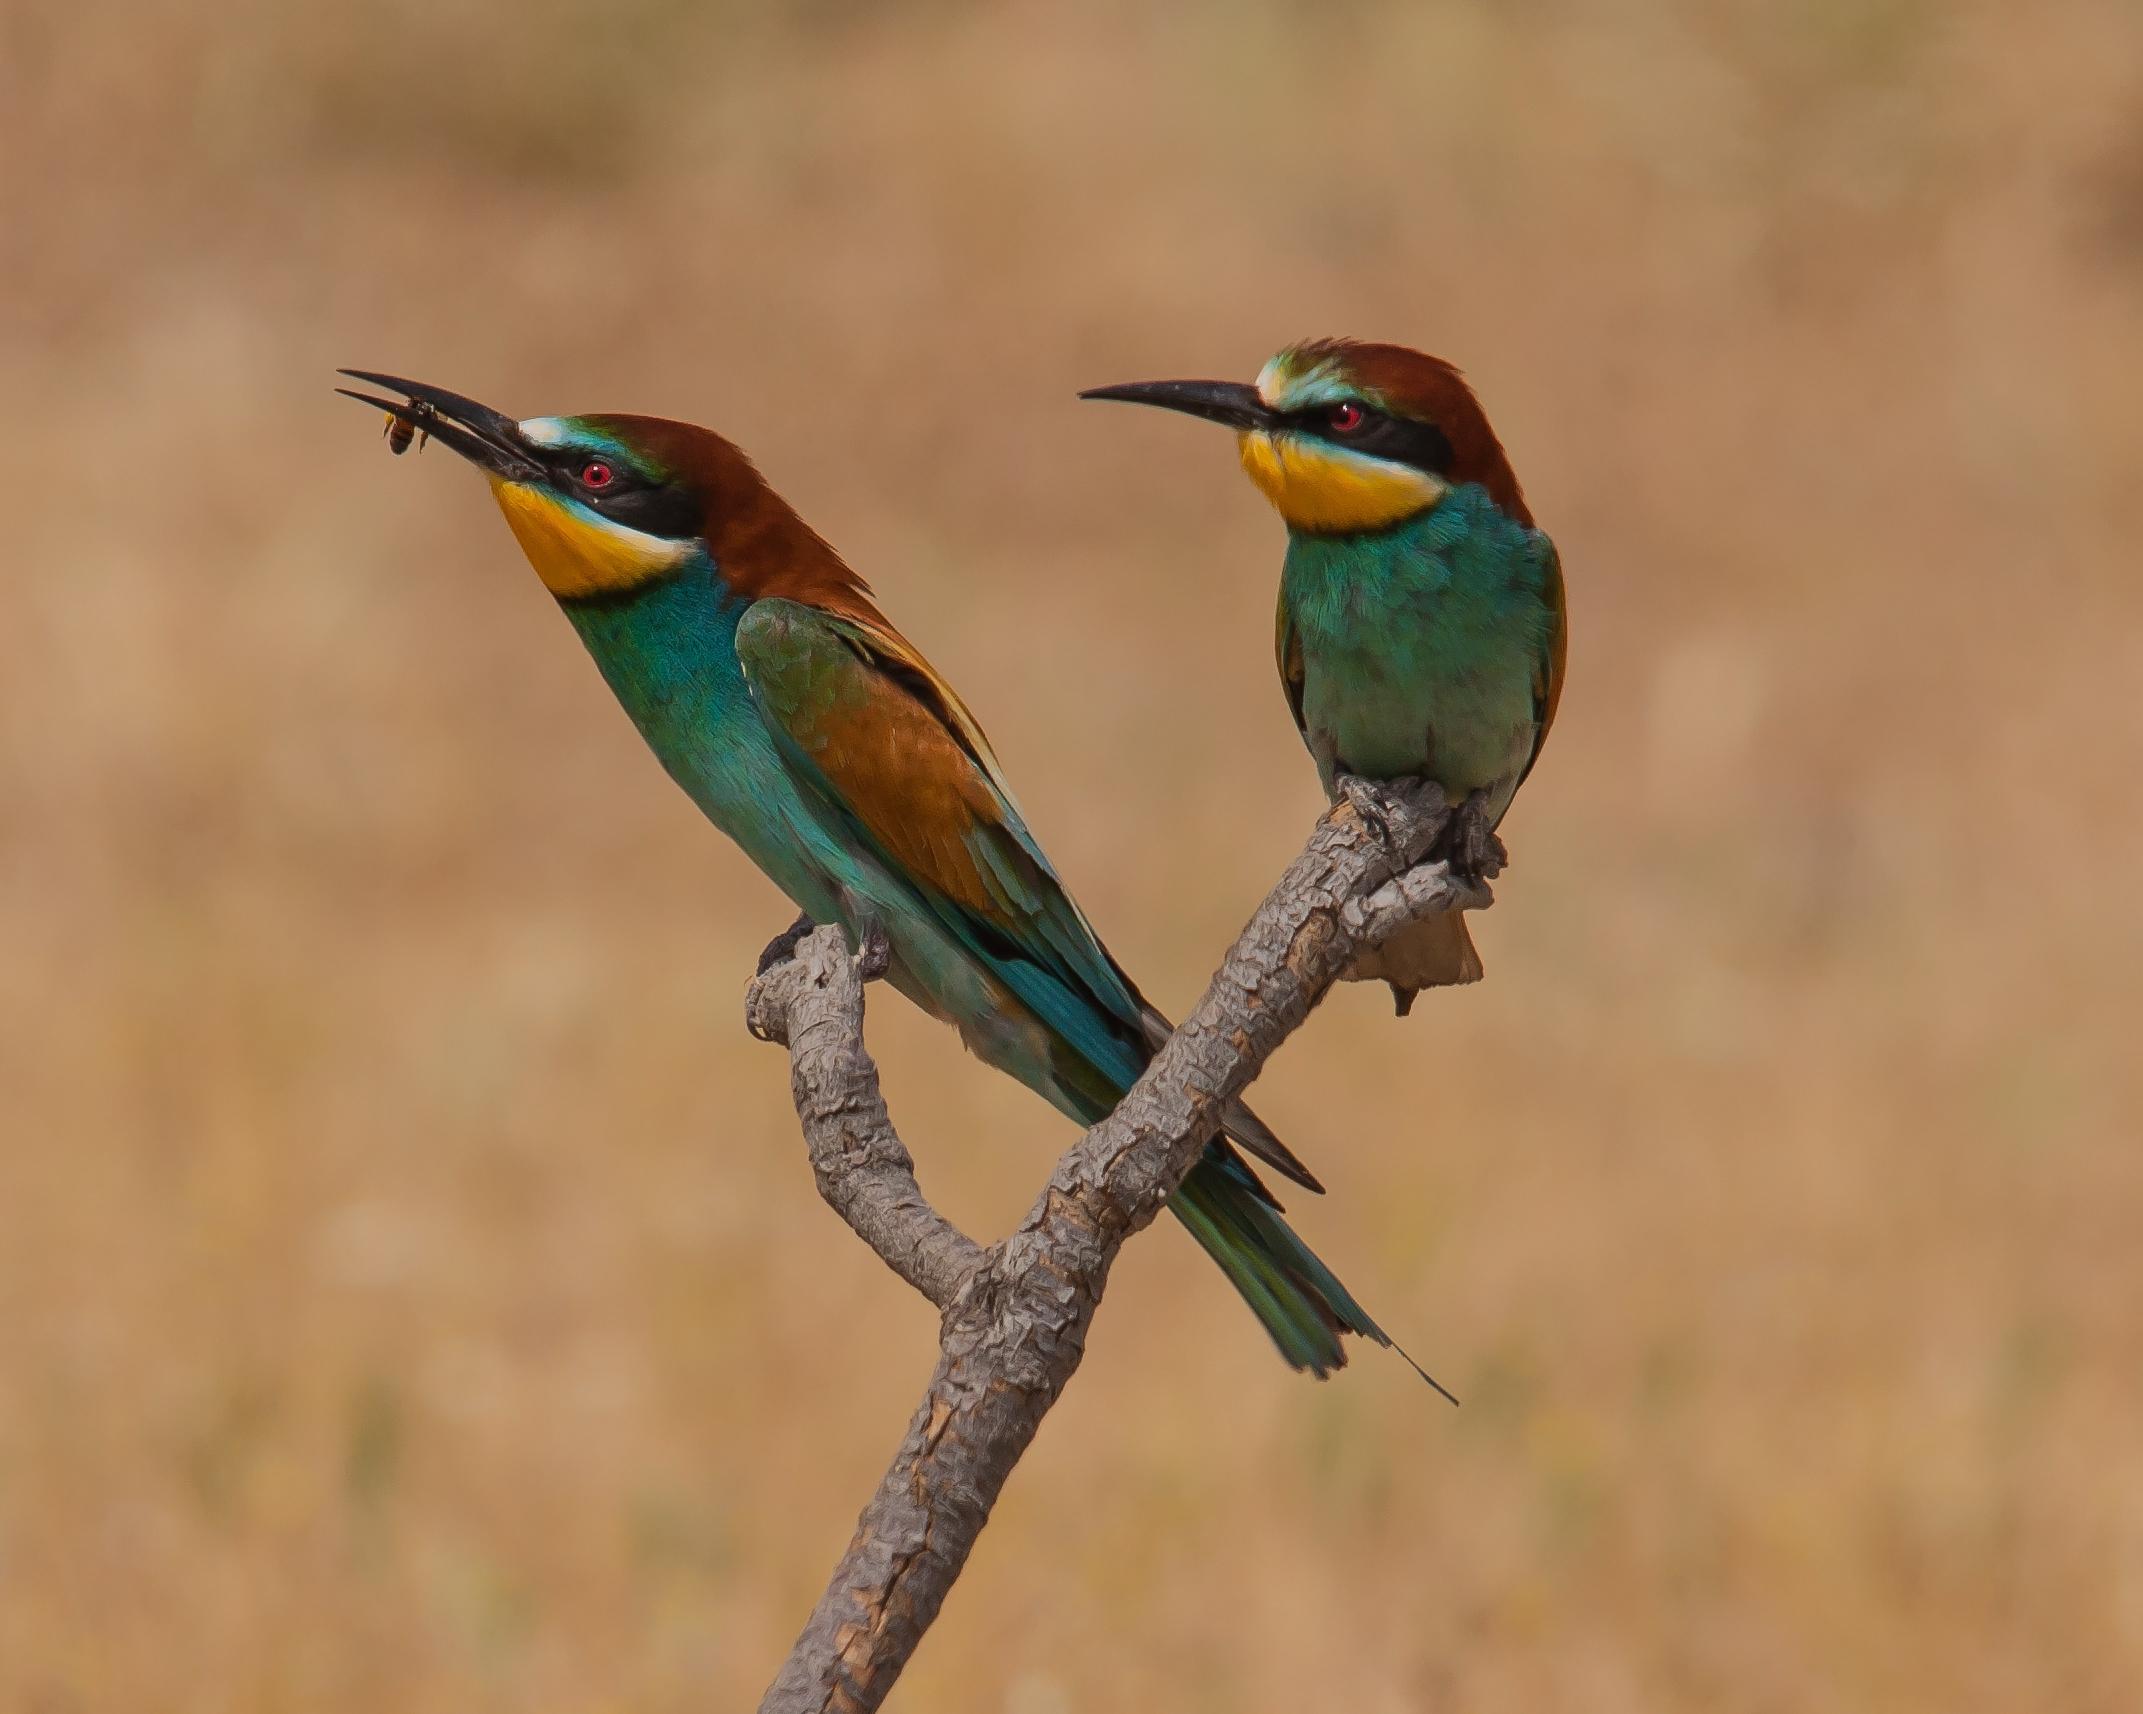 European Bee-eater merops apiaster near Tiskanias River estuary Lesvos 11/05/10